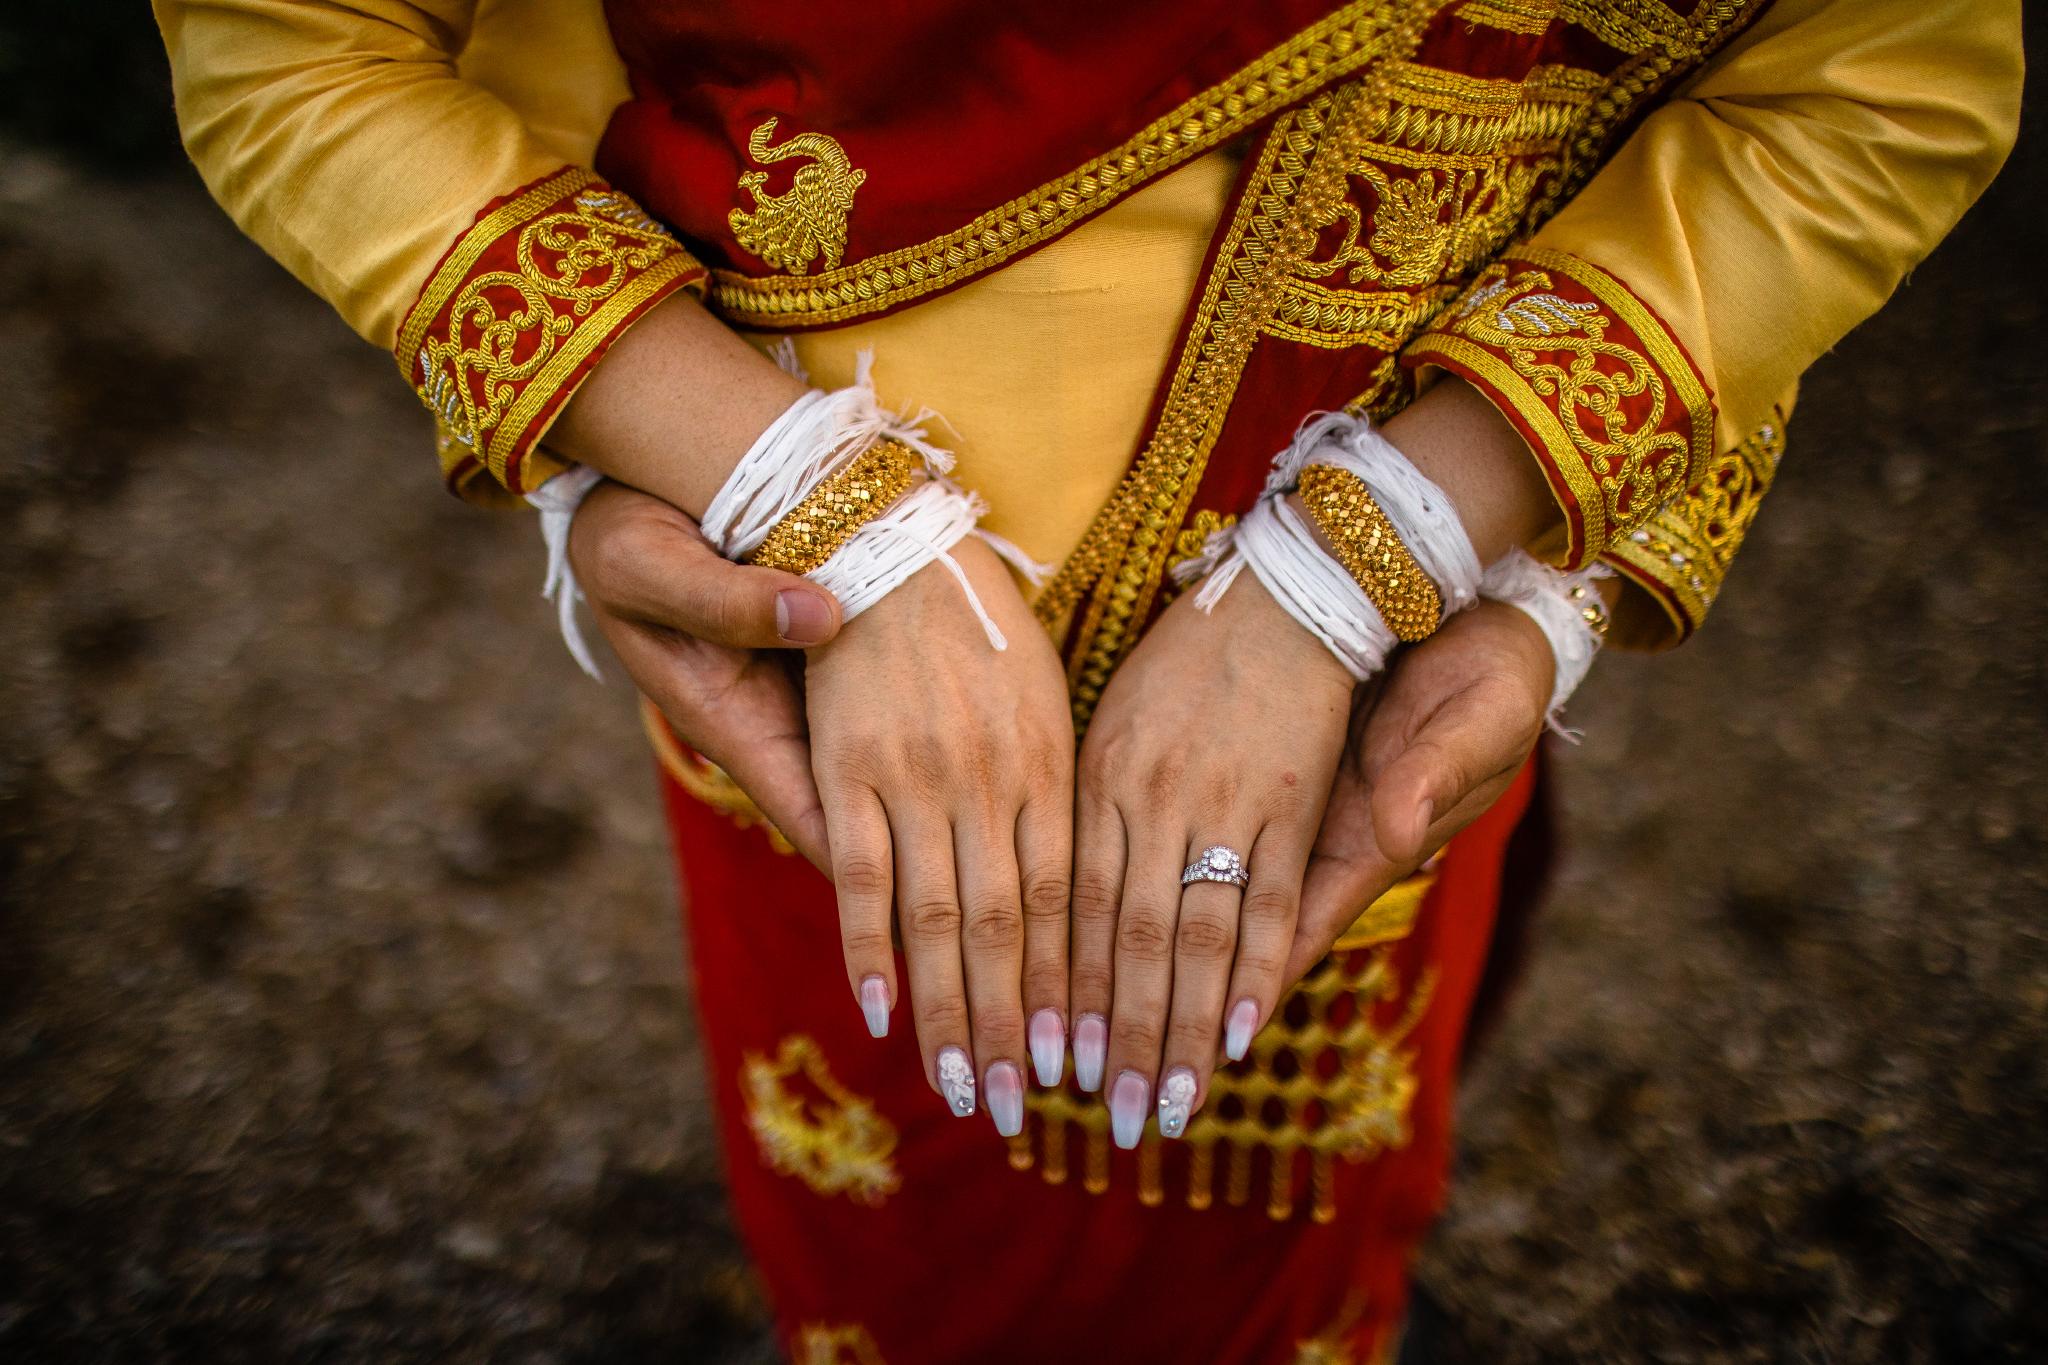 san diego wedding   photographer | hands wearing ornaments